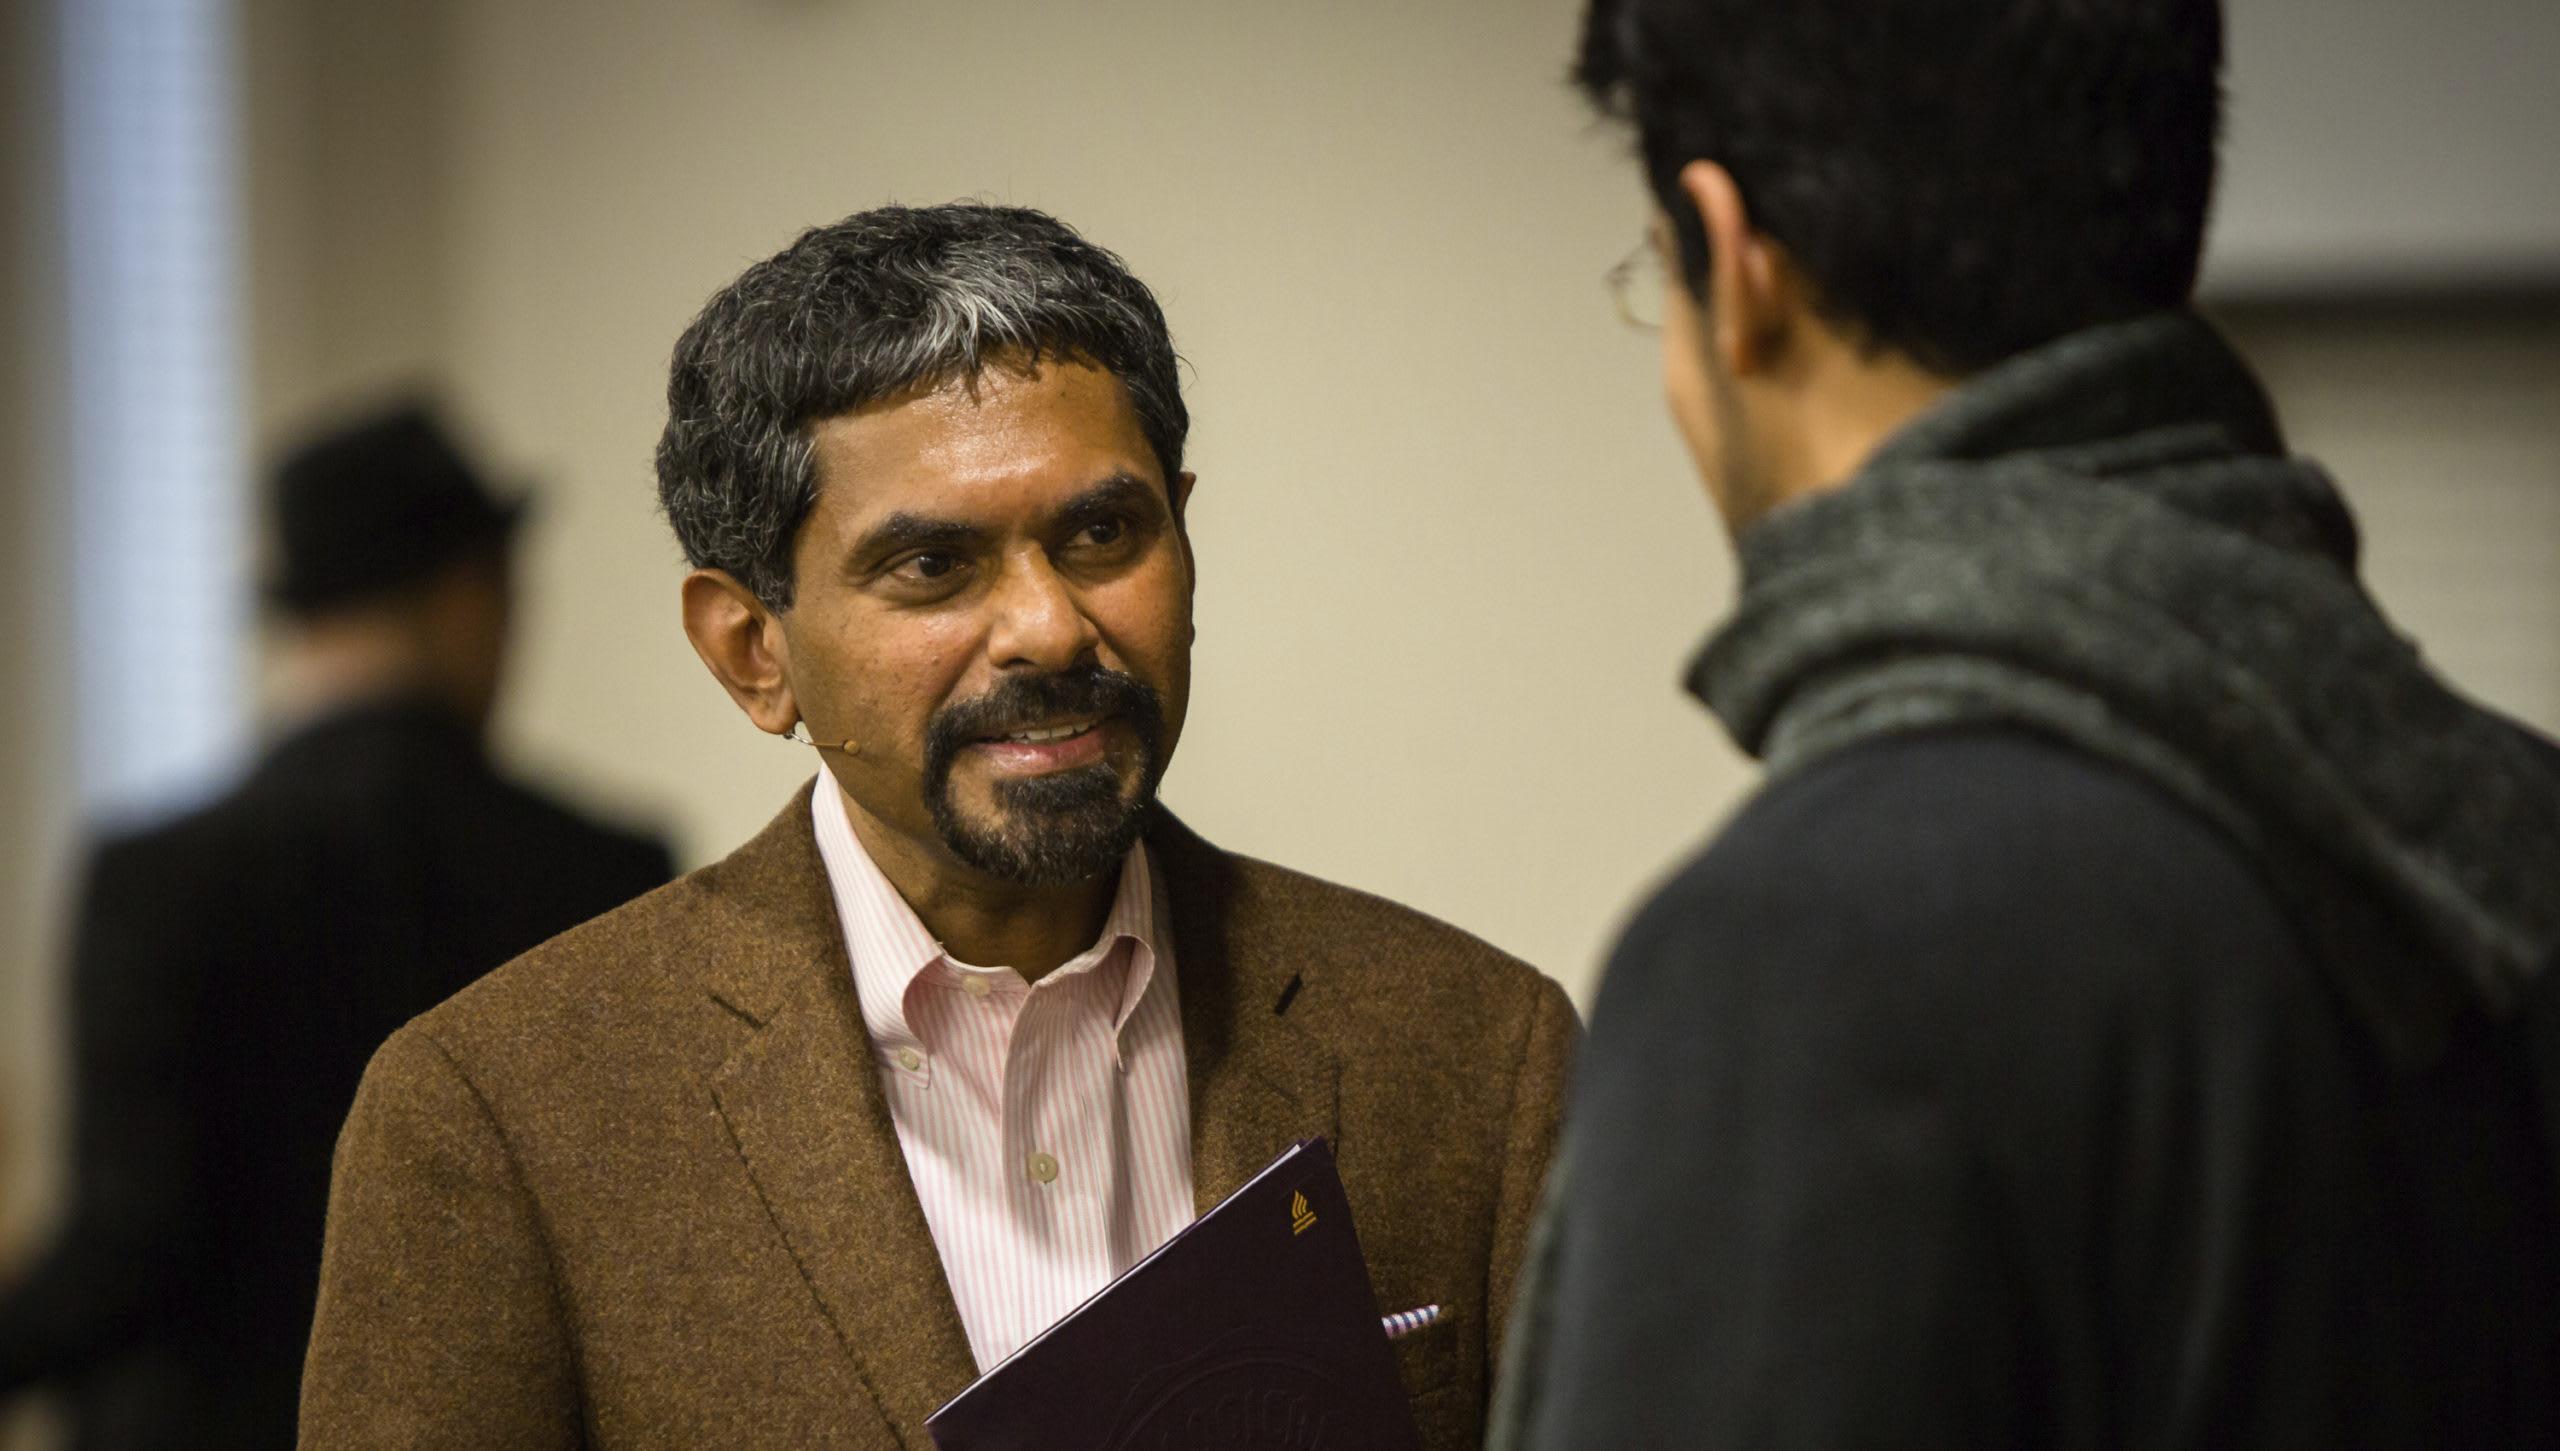 Kuruvilla talking to a student